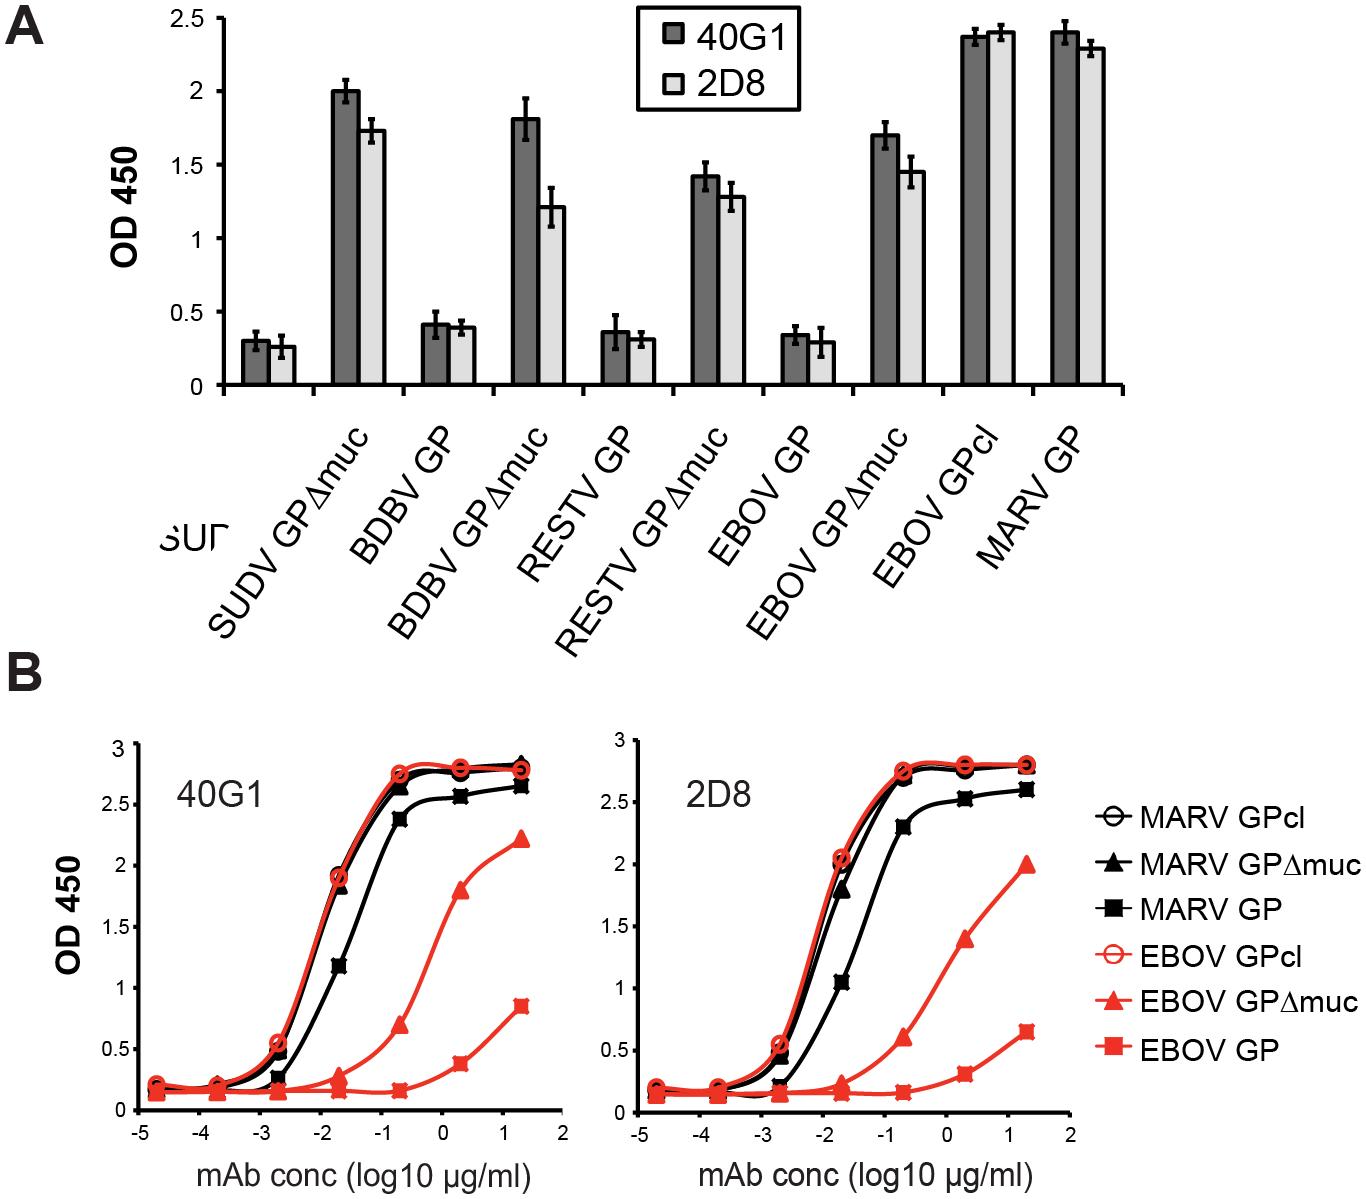 Filovirus GP cross-reactivity of 40G1 and 2D8.